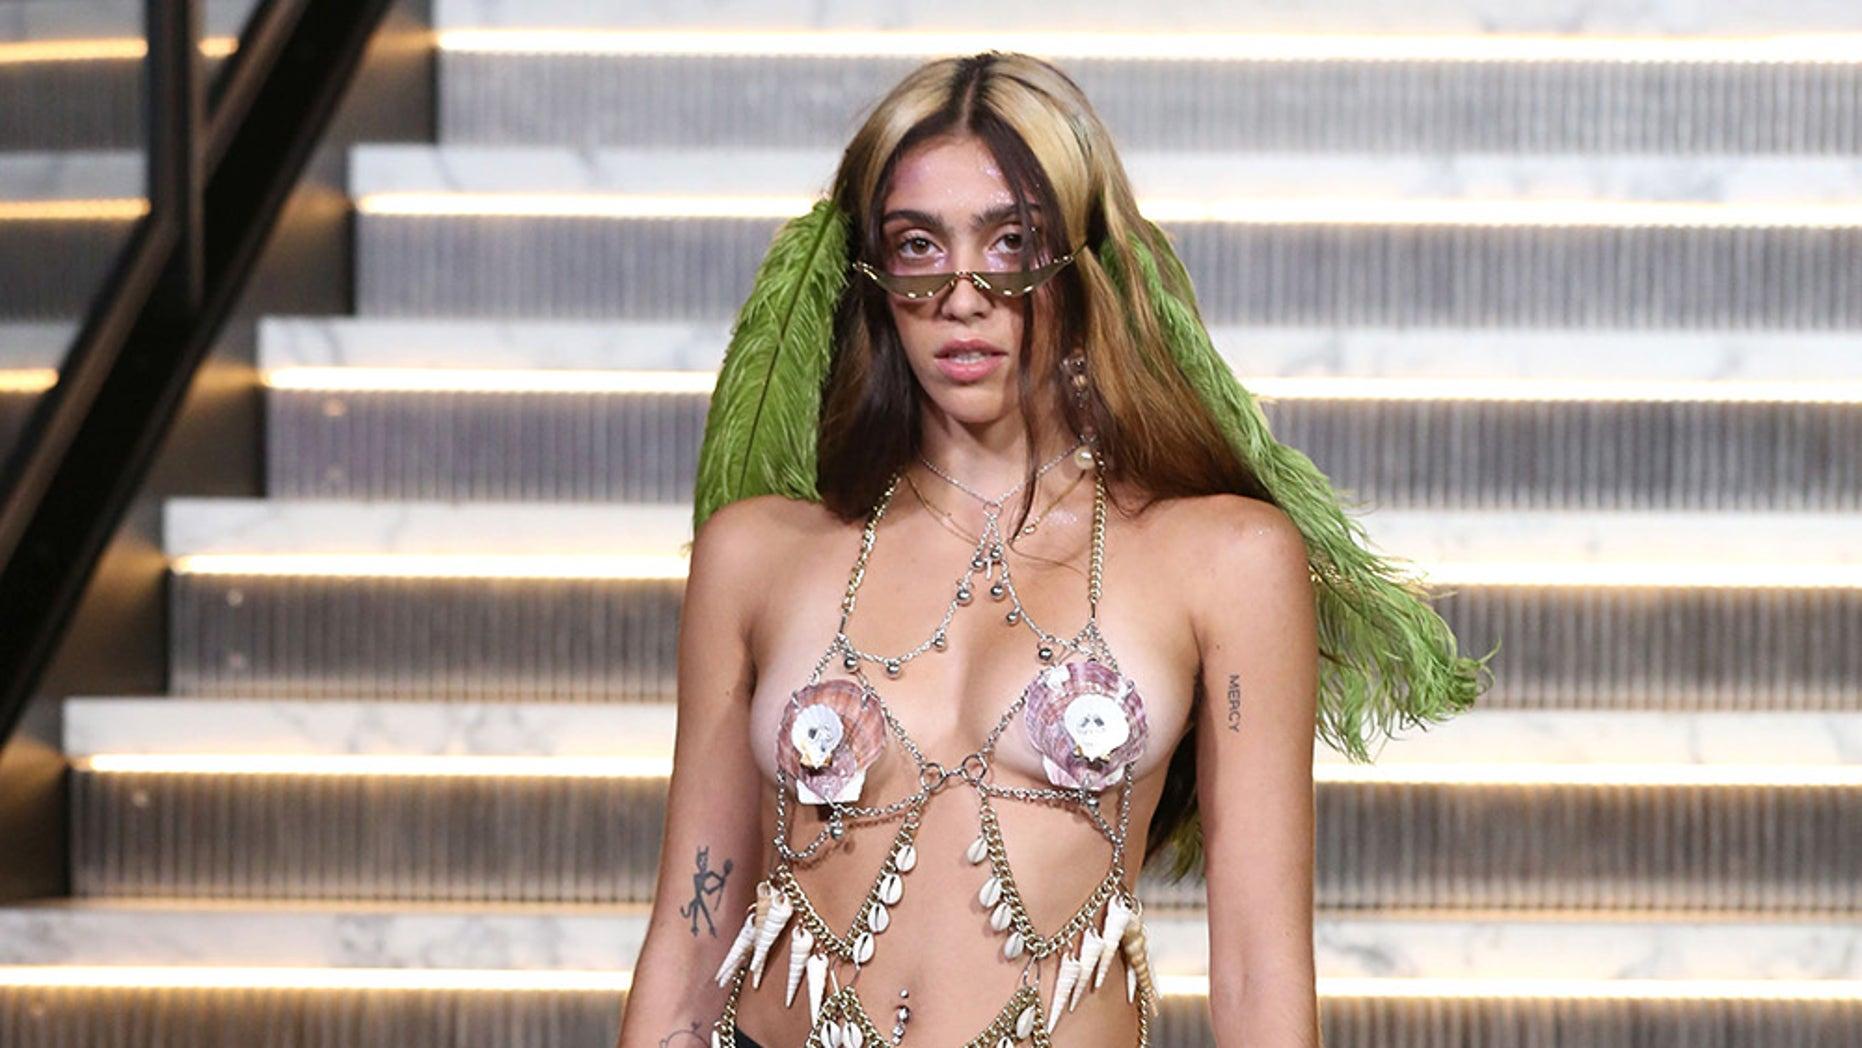 Madonna's daughter Lourdes Leon made heads turn during New York Fashion Week